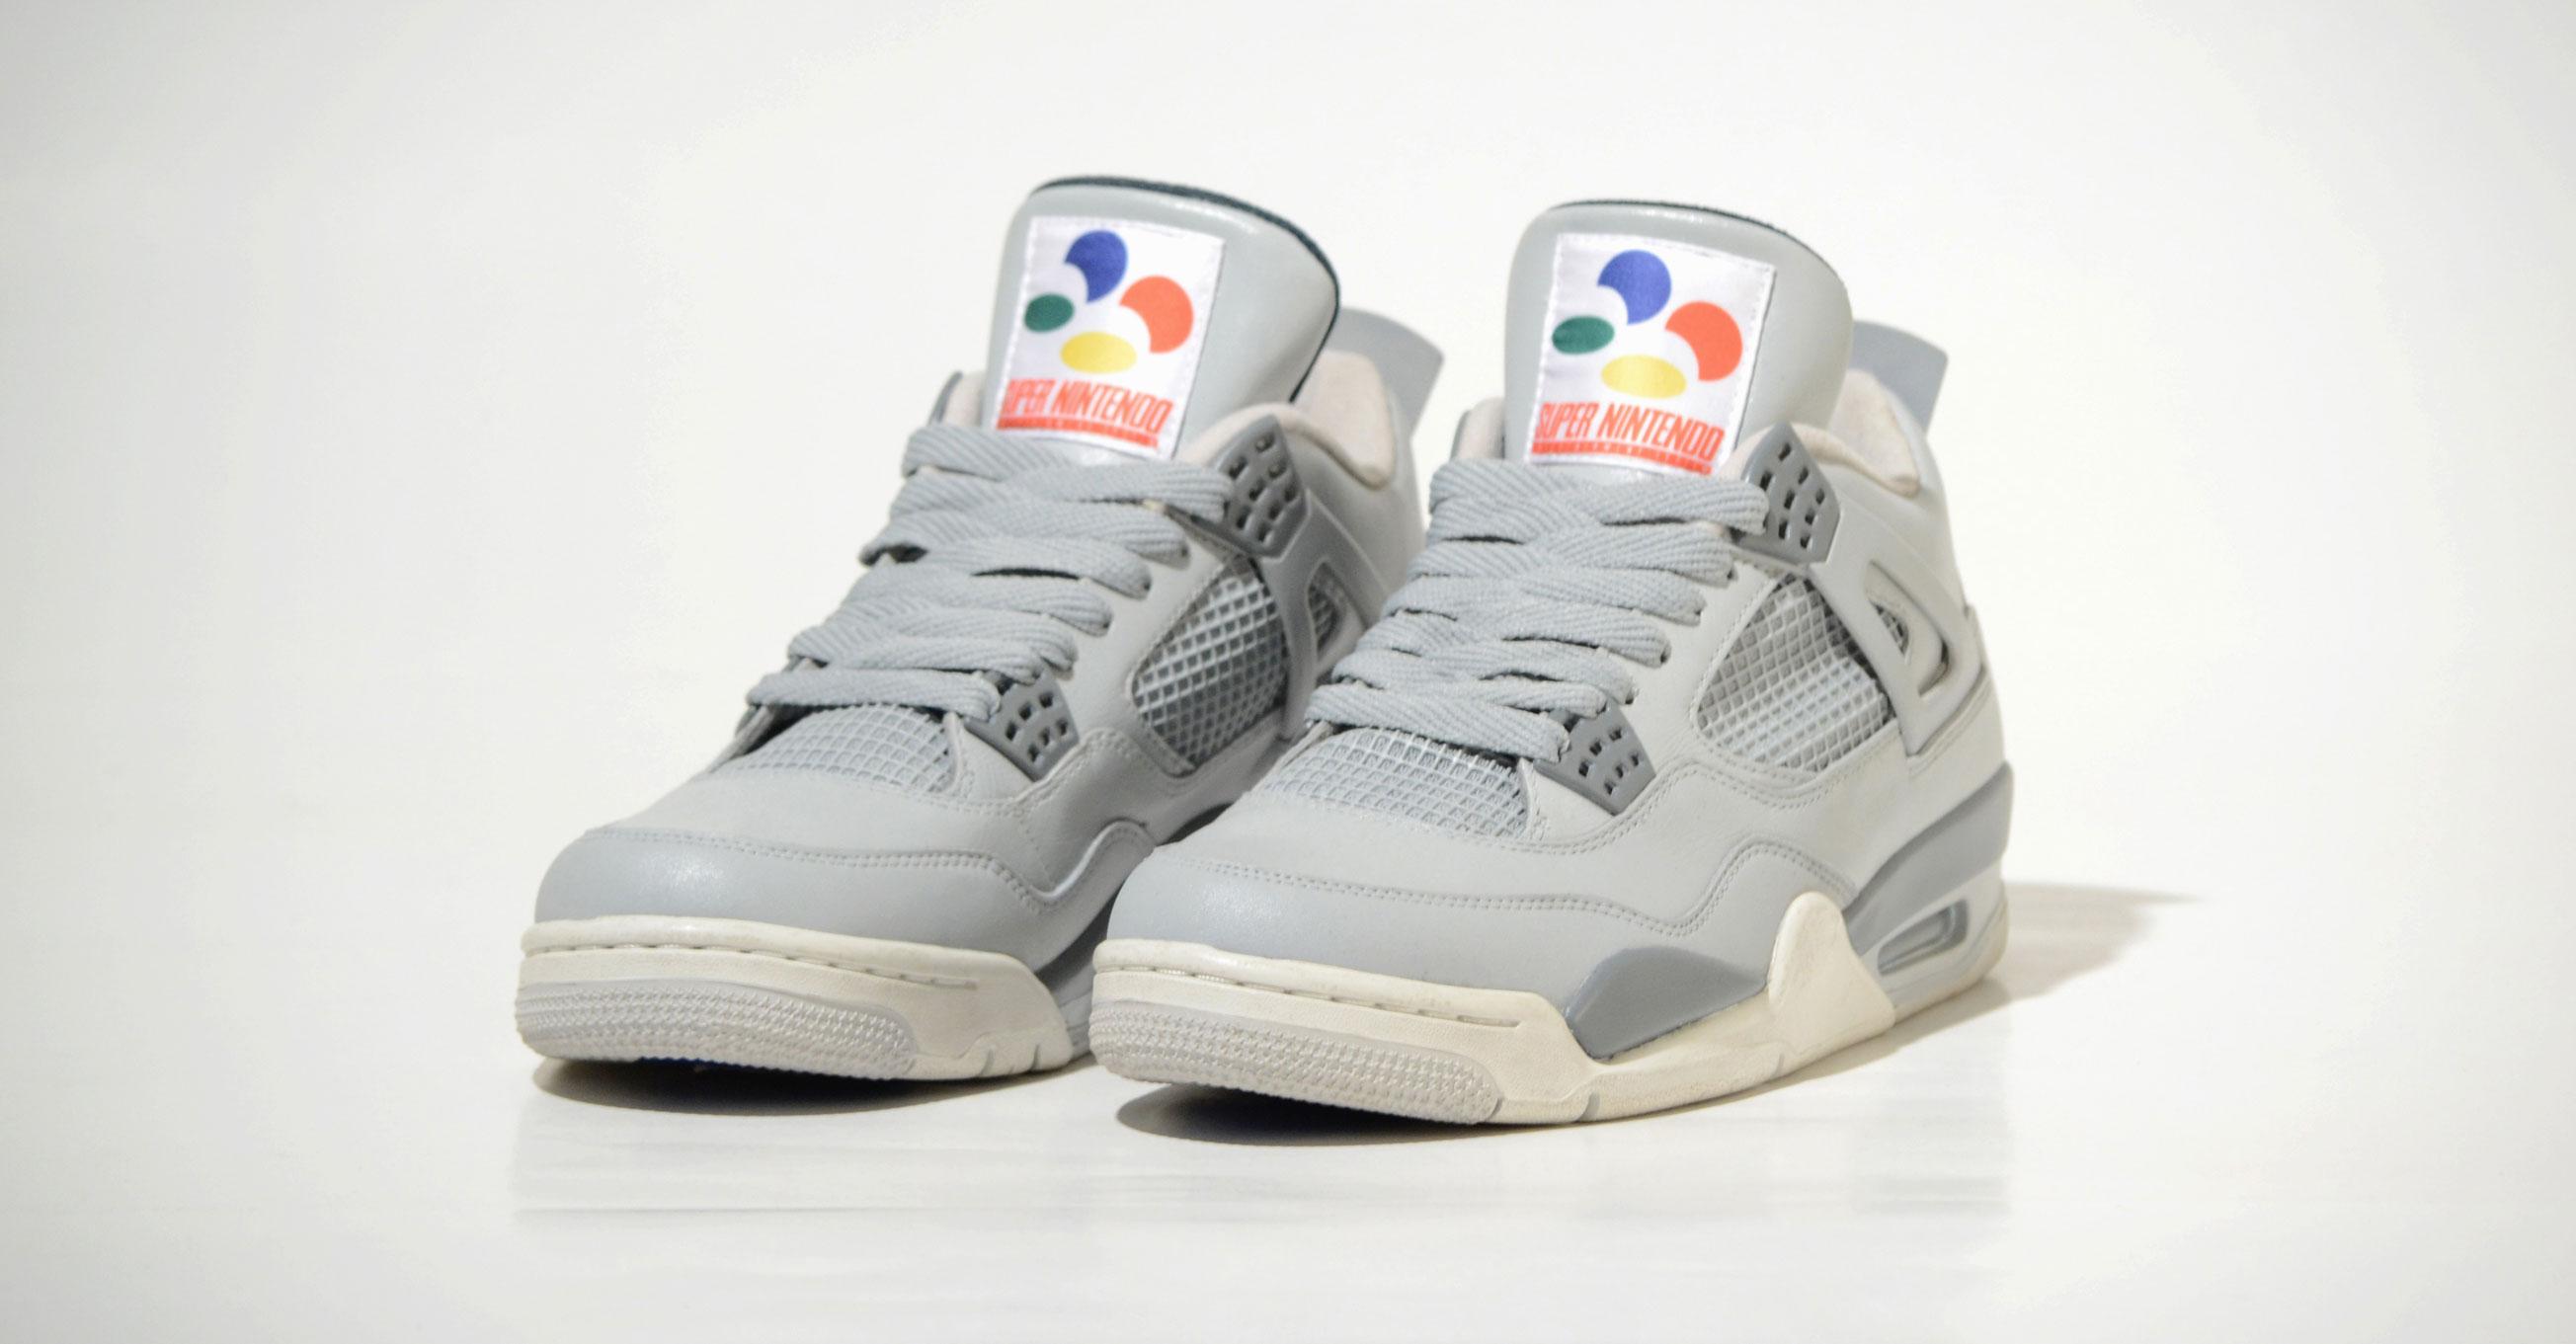 Air Jordan 4 SNES edition